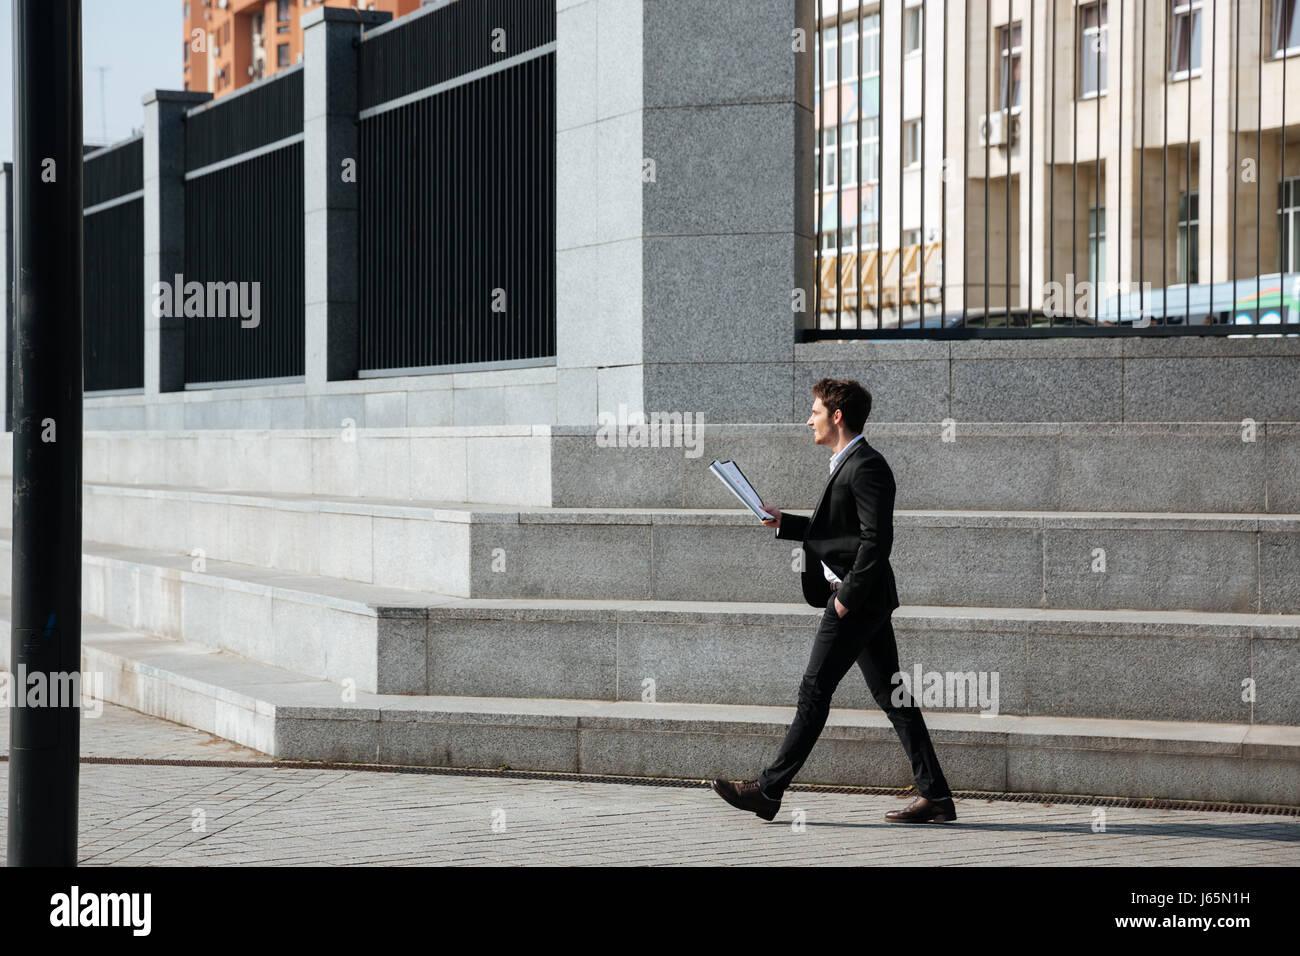 Full-length of businessman holding folder standing near stairs in the sreet - Stock Image